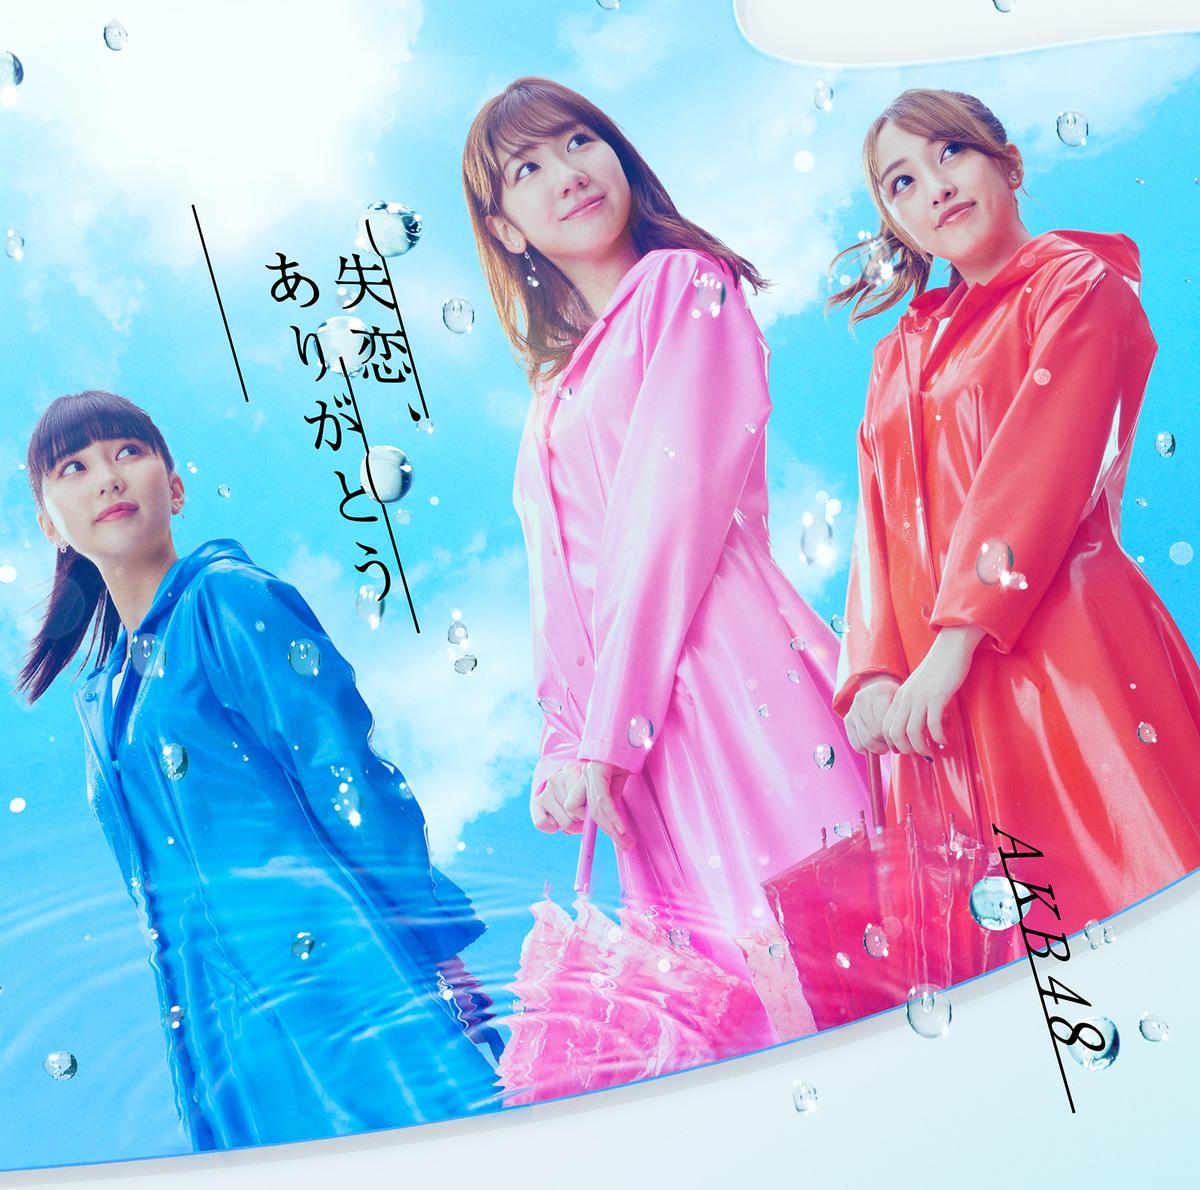 AKB48『失恋、ありがとう(初回限定盤C)』キングレコード、2020年